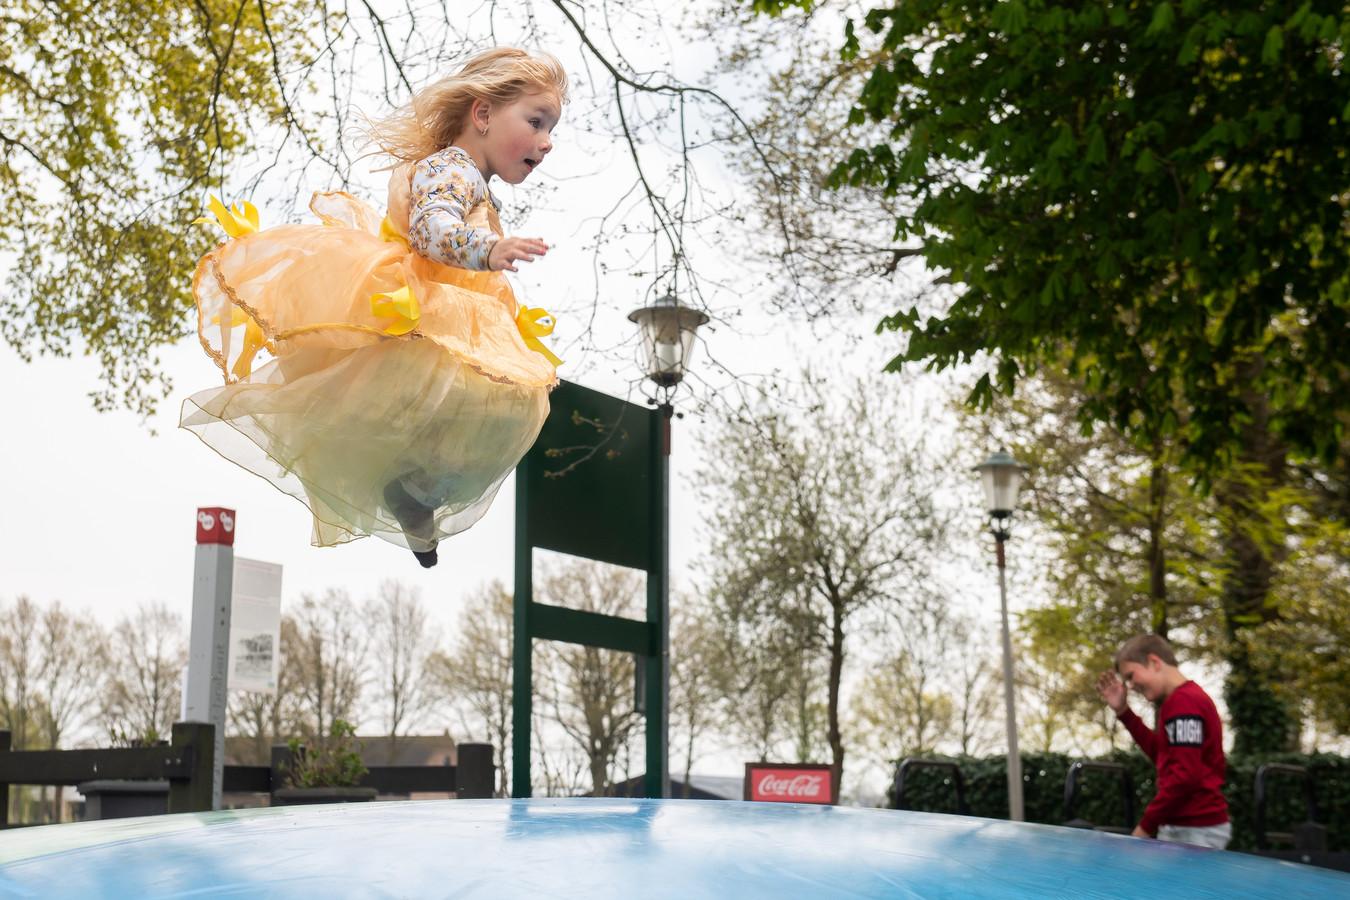 Breda - Pix4Profs/René Schotanus. De 4-jarige Demi in haar prinsessenjurk springt er lustig op los.